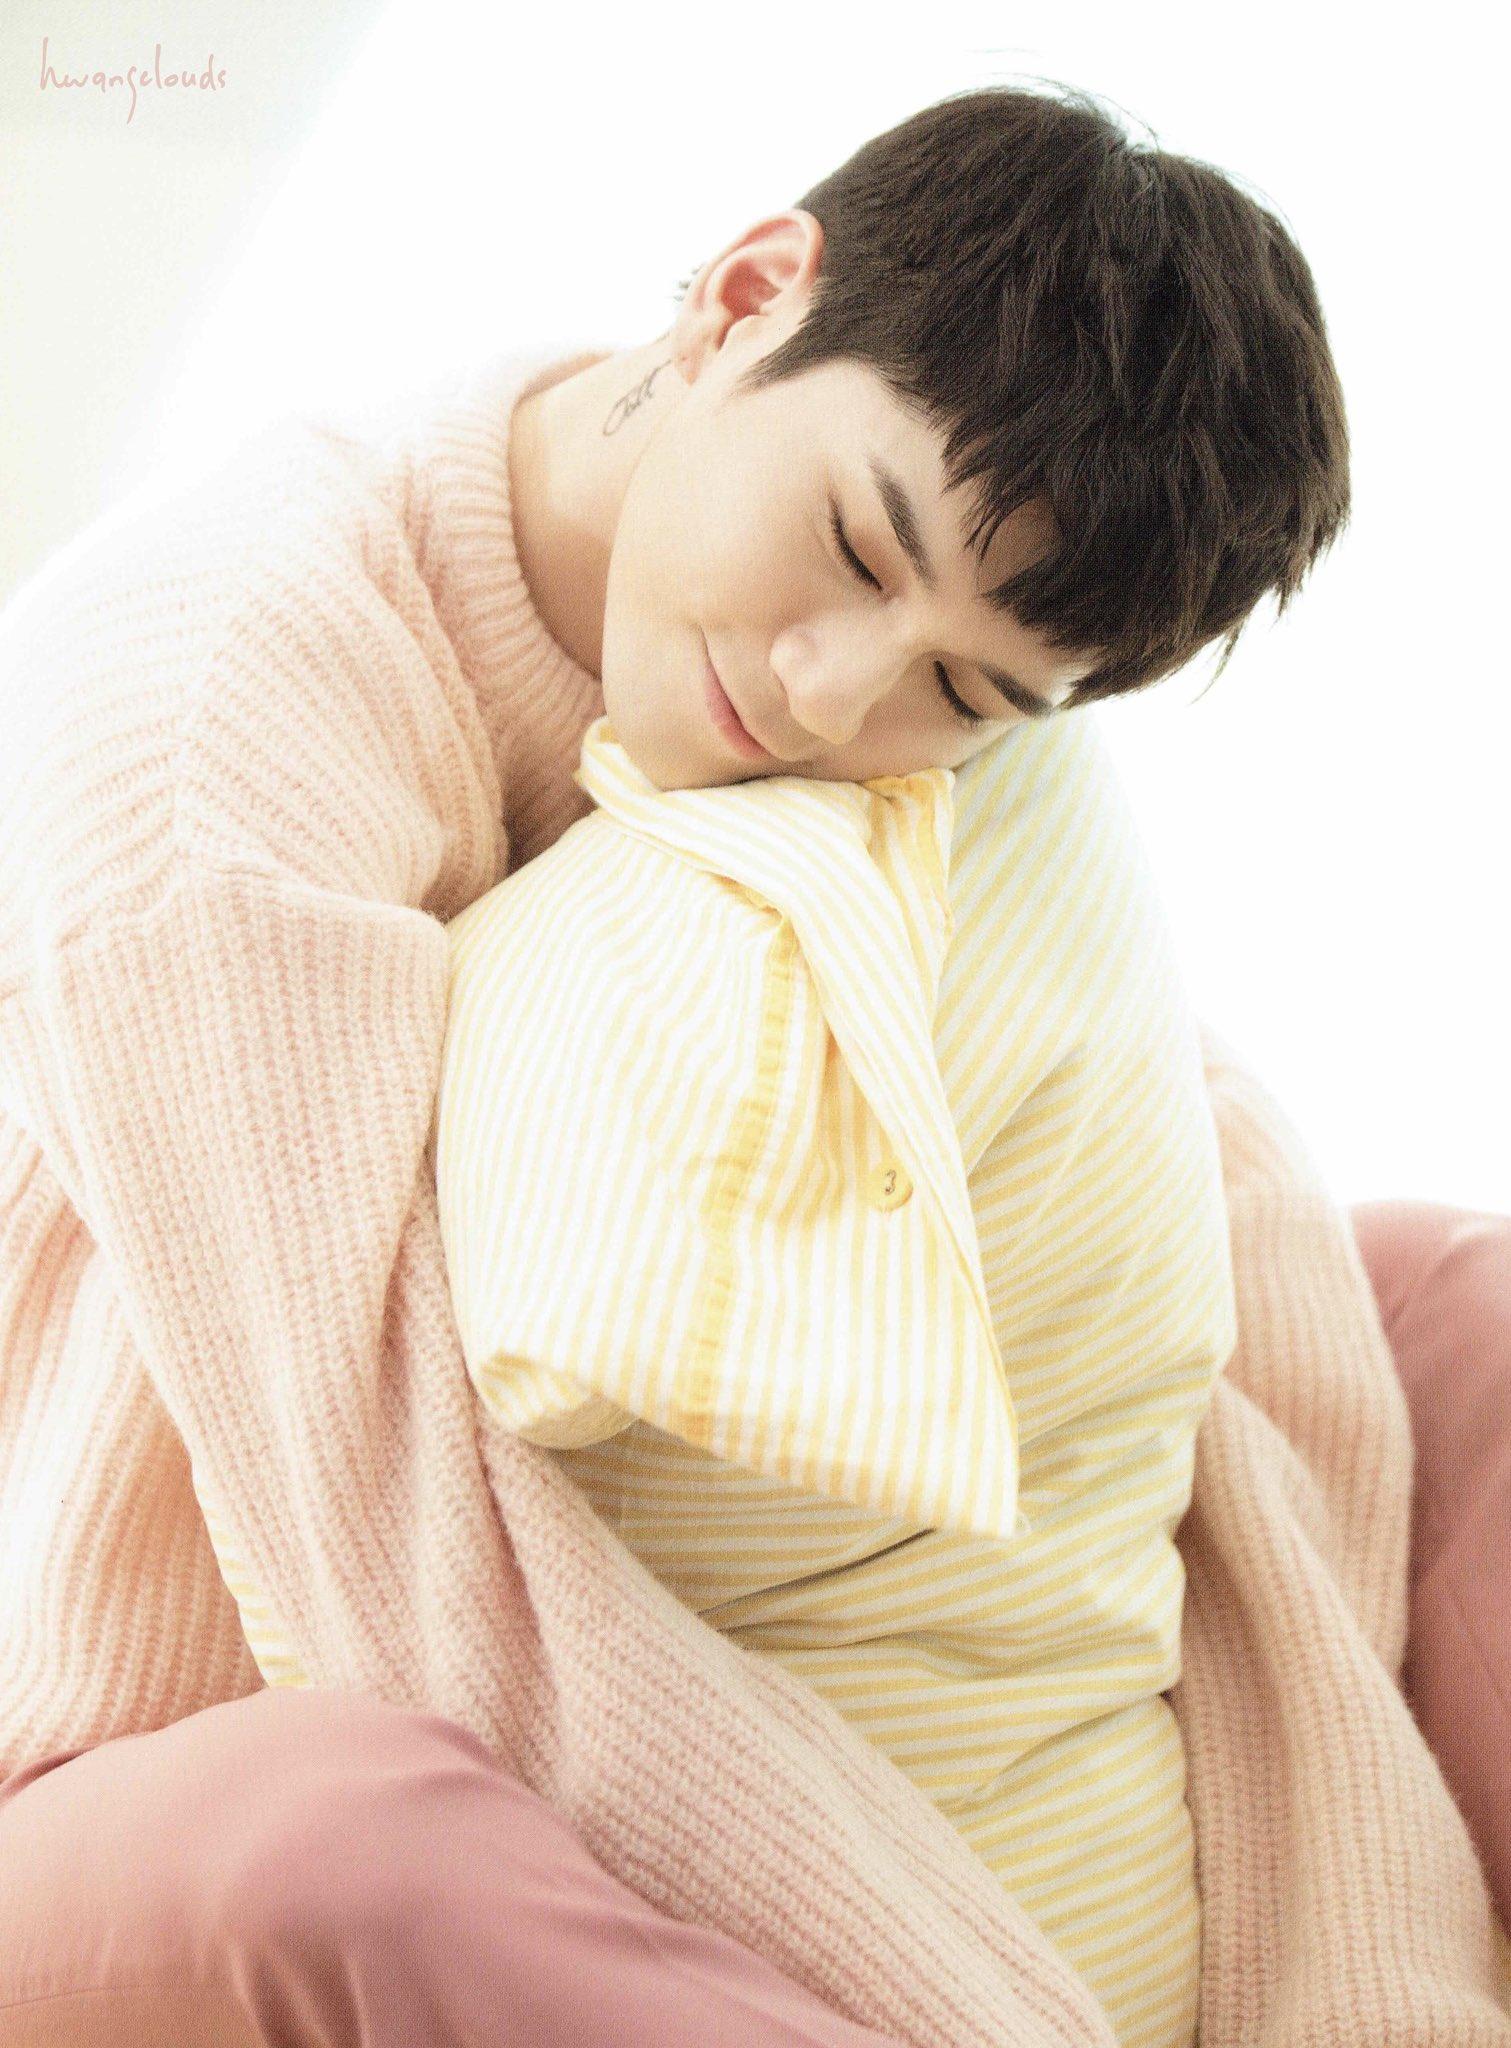 [SCAN] Wanna One Photo Essay Season 2 (3) #옹성우 #강다니엘 #워너원 #WannaOne https://t.co/CZPcnxIFNq